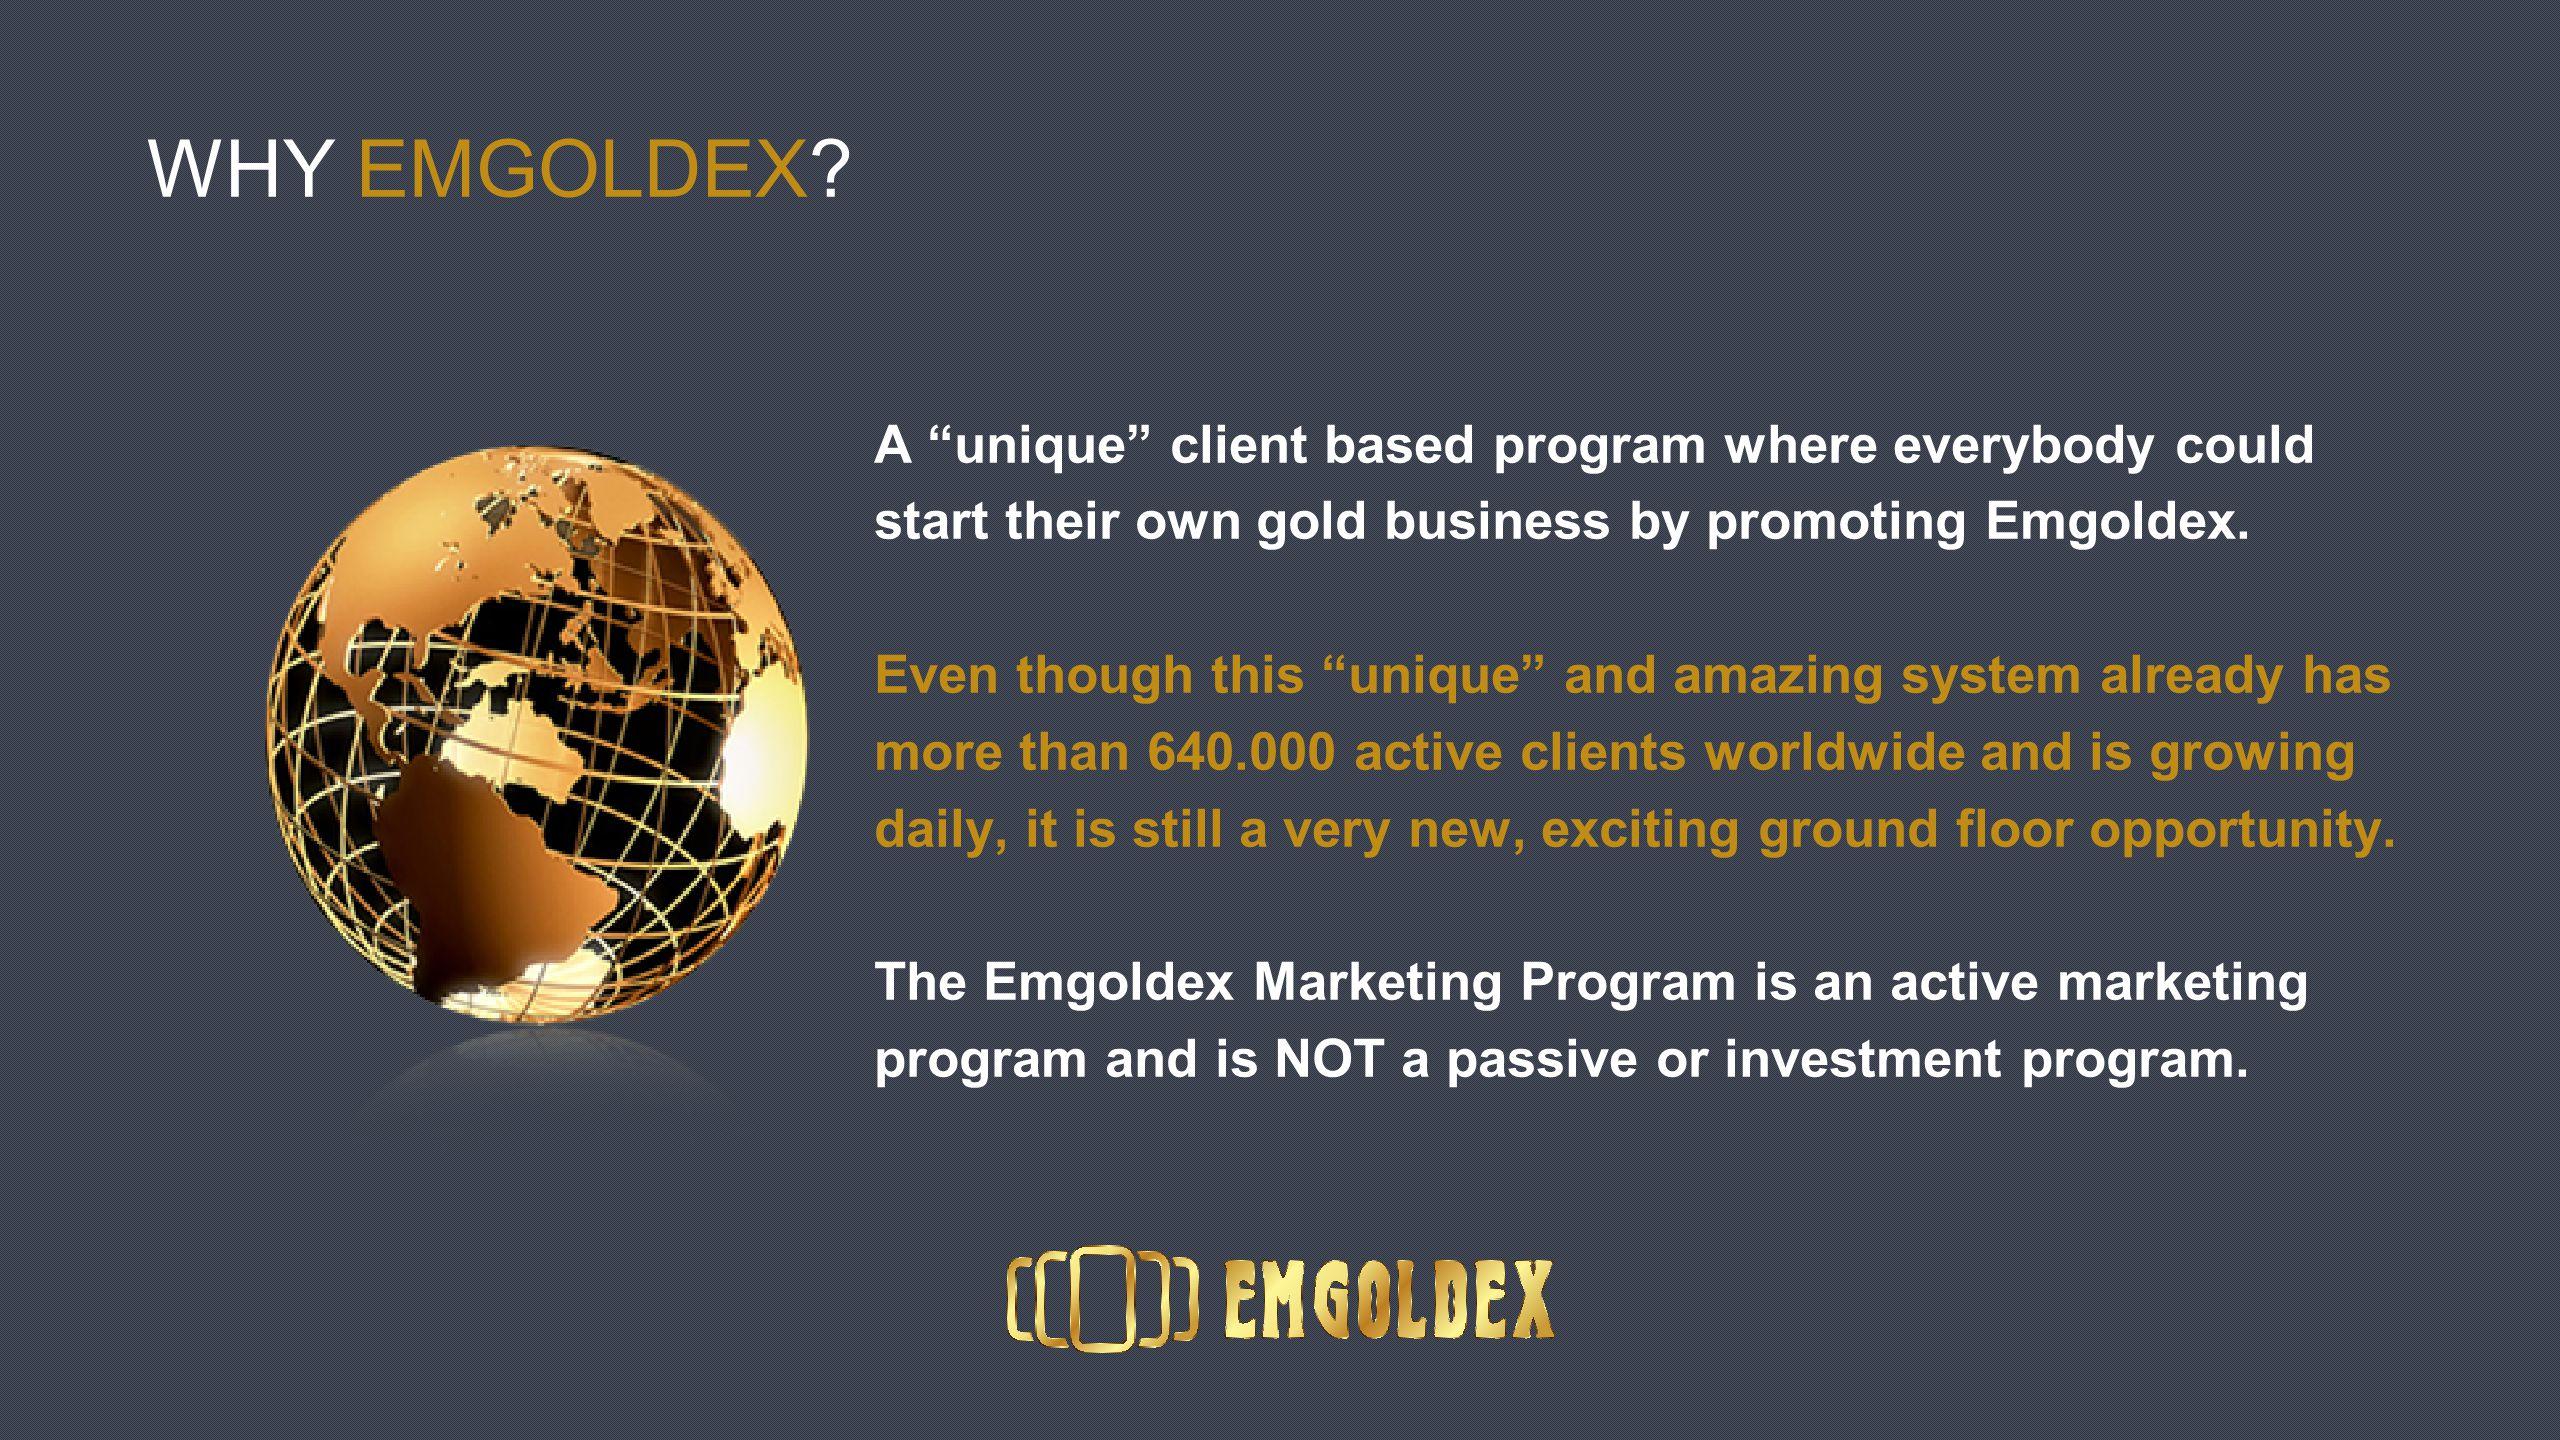 WHY EMGOLDEX.